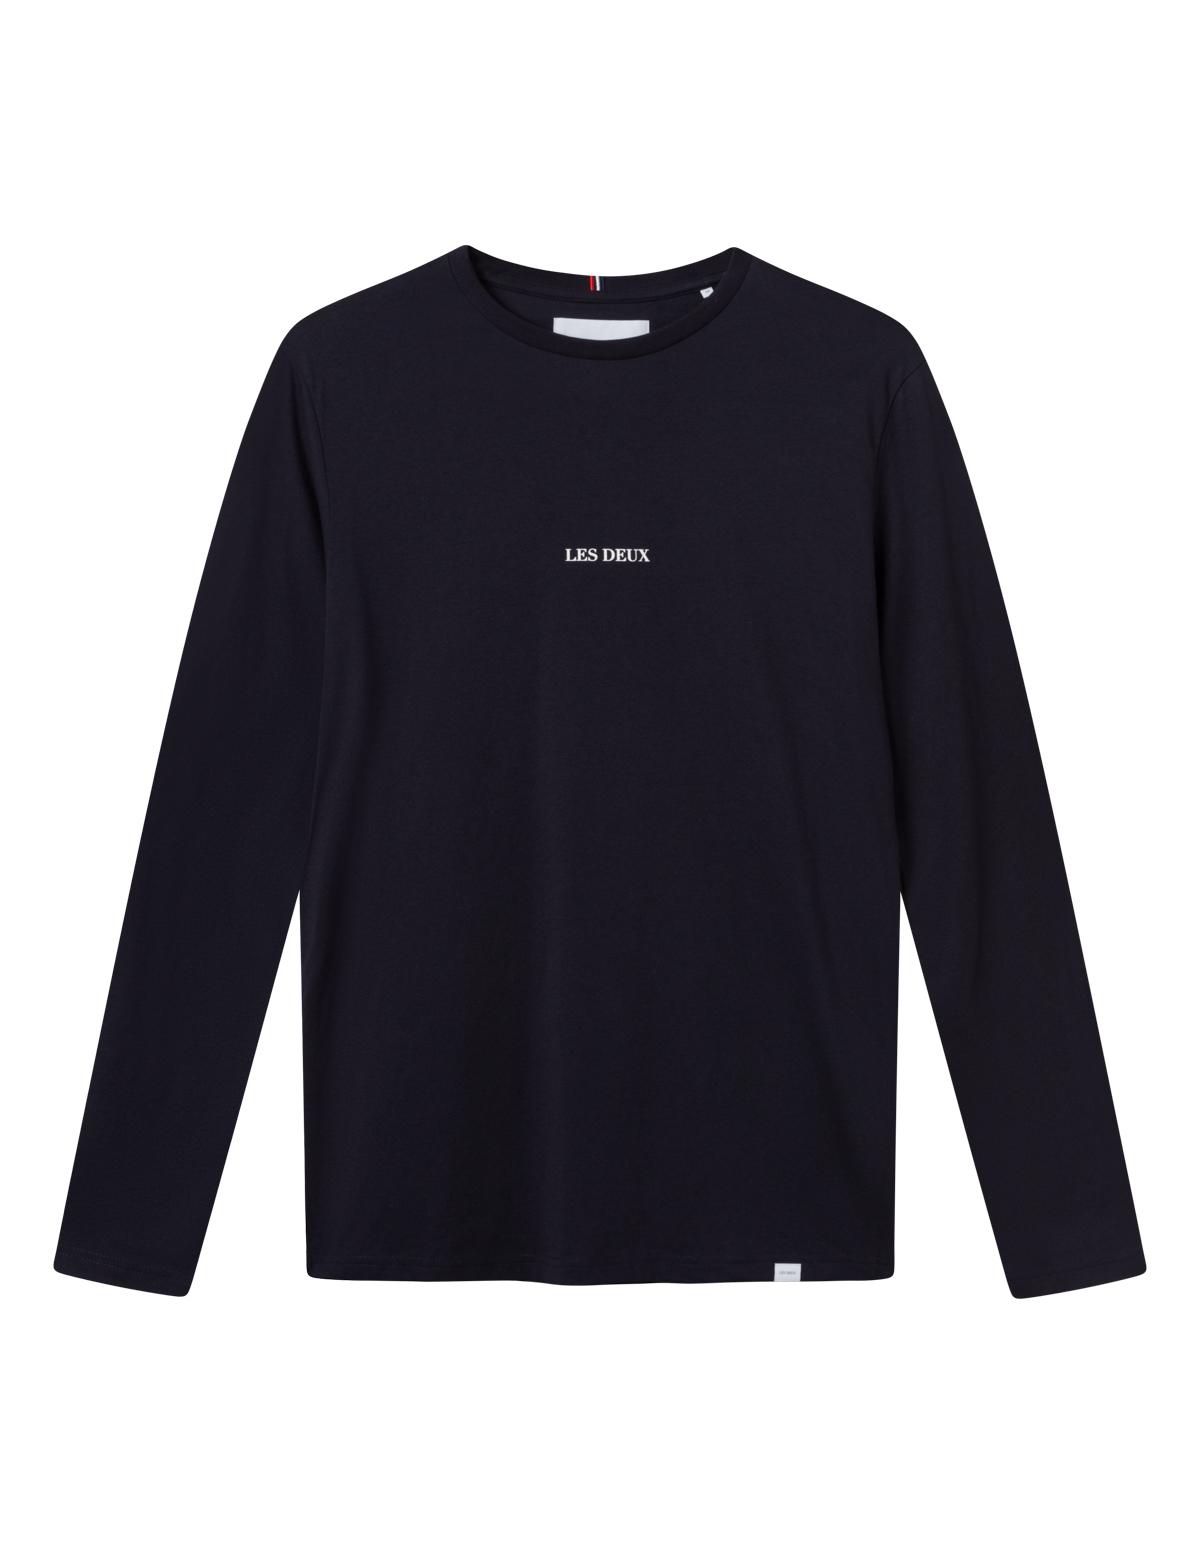 Les Deux Lens LS t-shirt, dark navy/white, xx-large